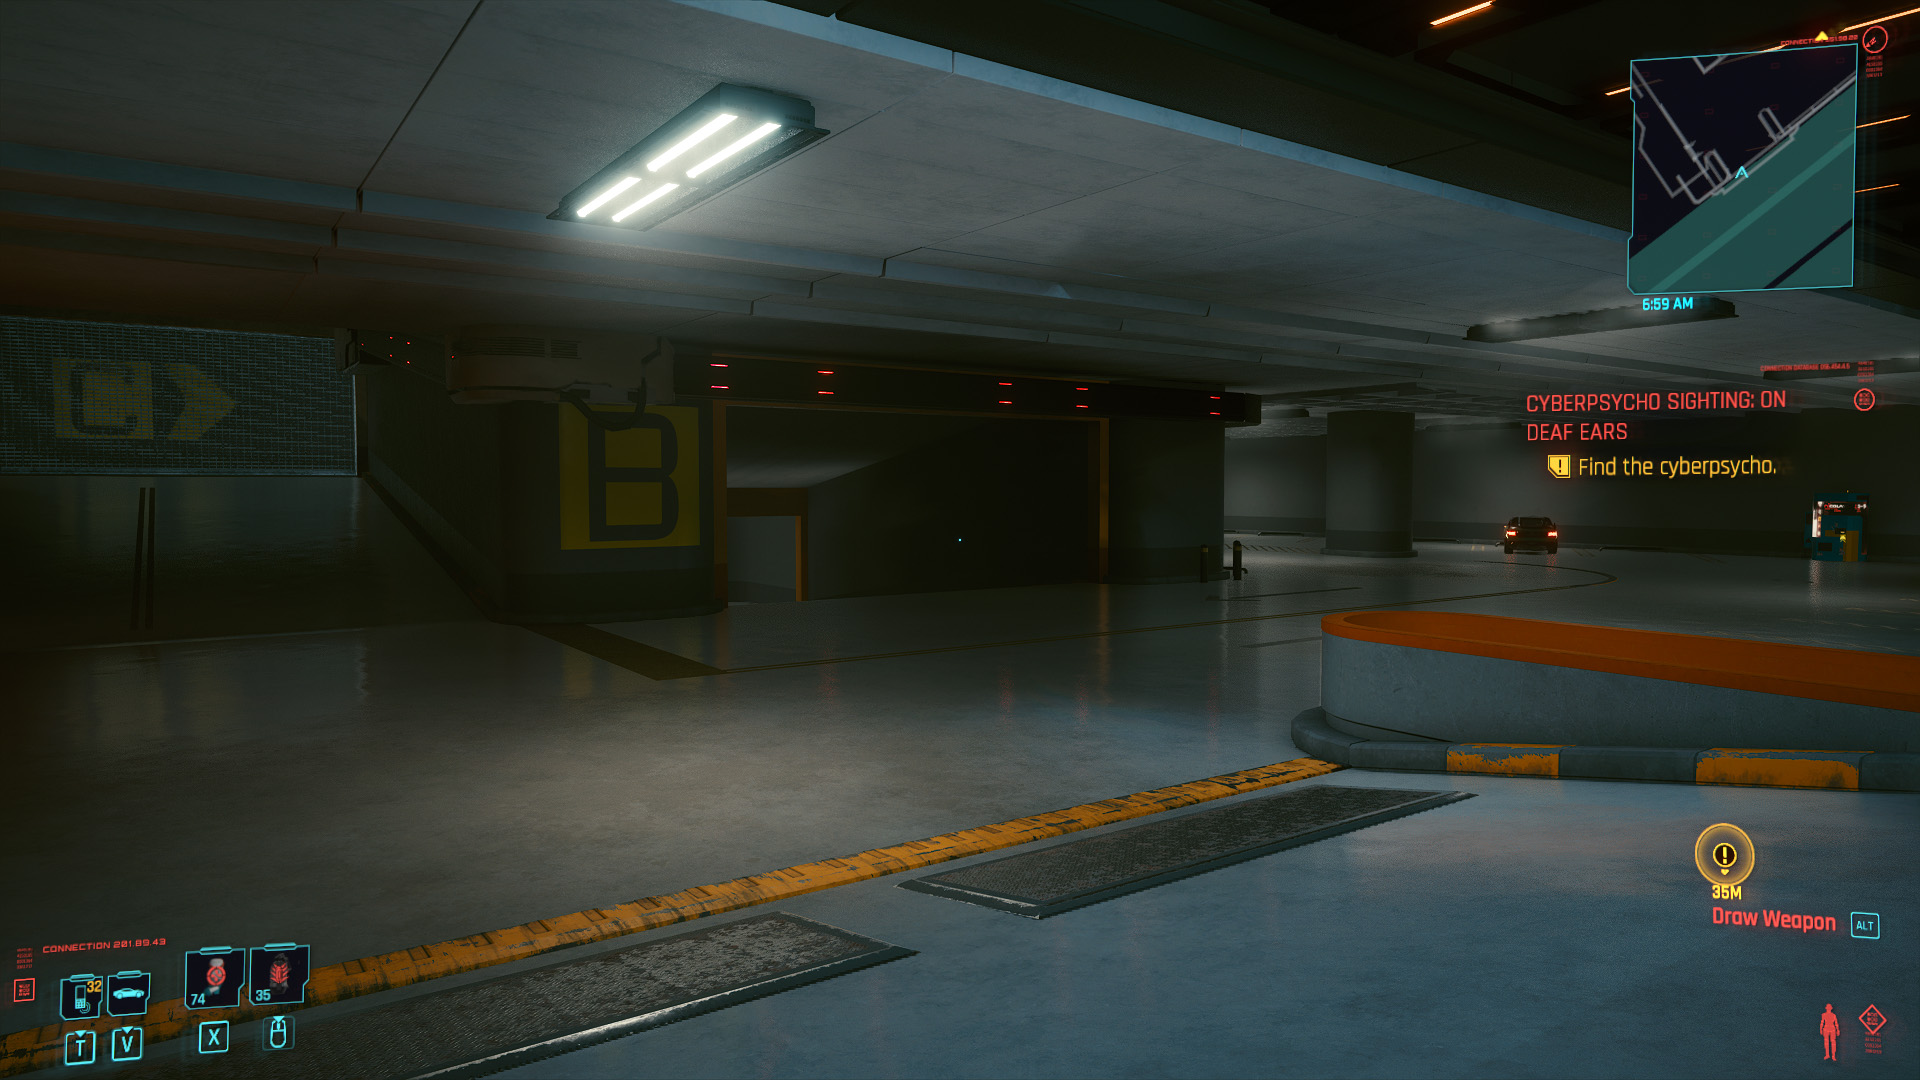 Cyberpunk 2077 Cyberpsycho Sighting locations